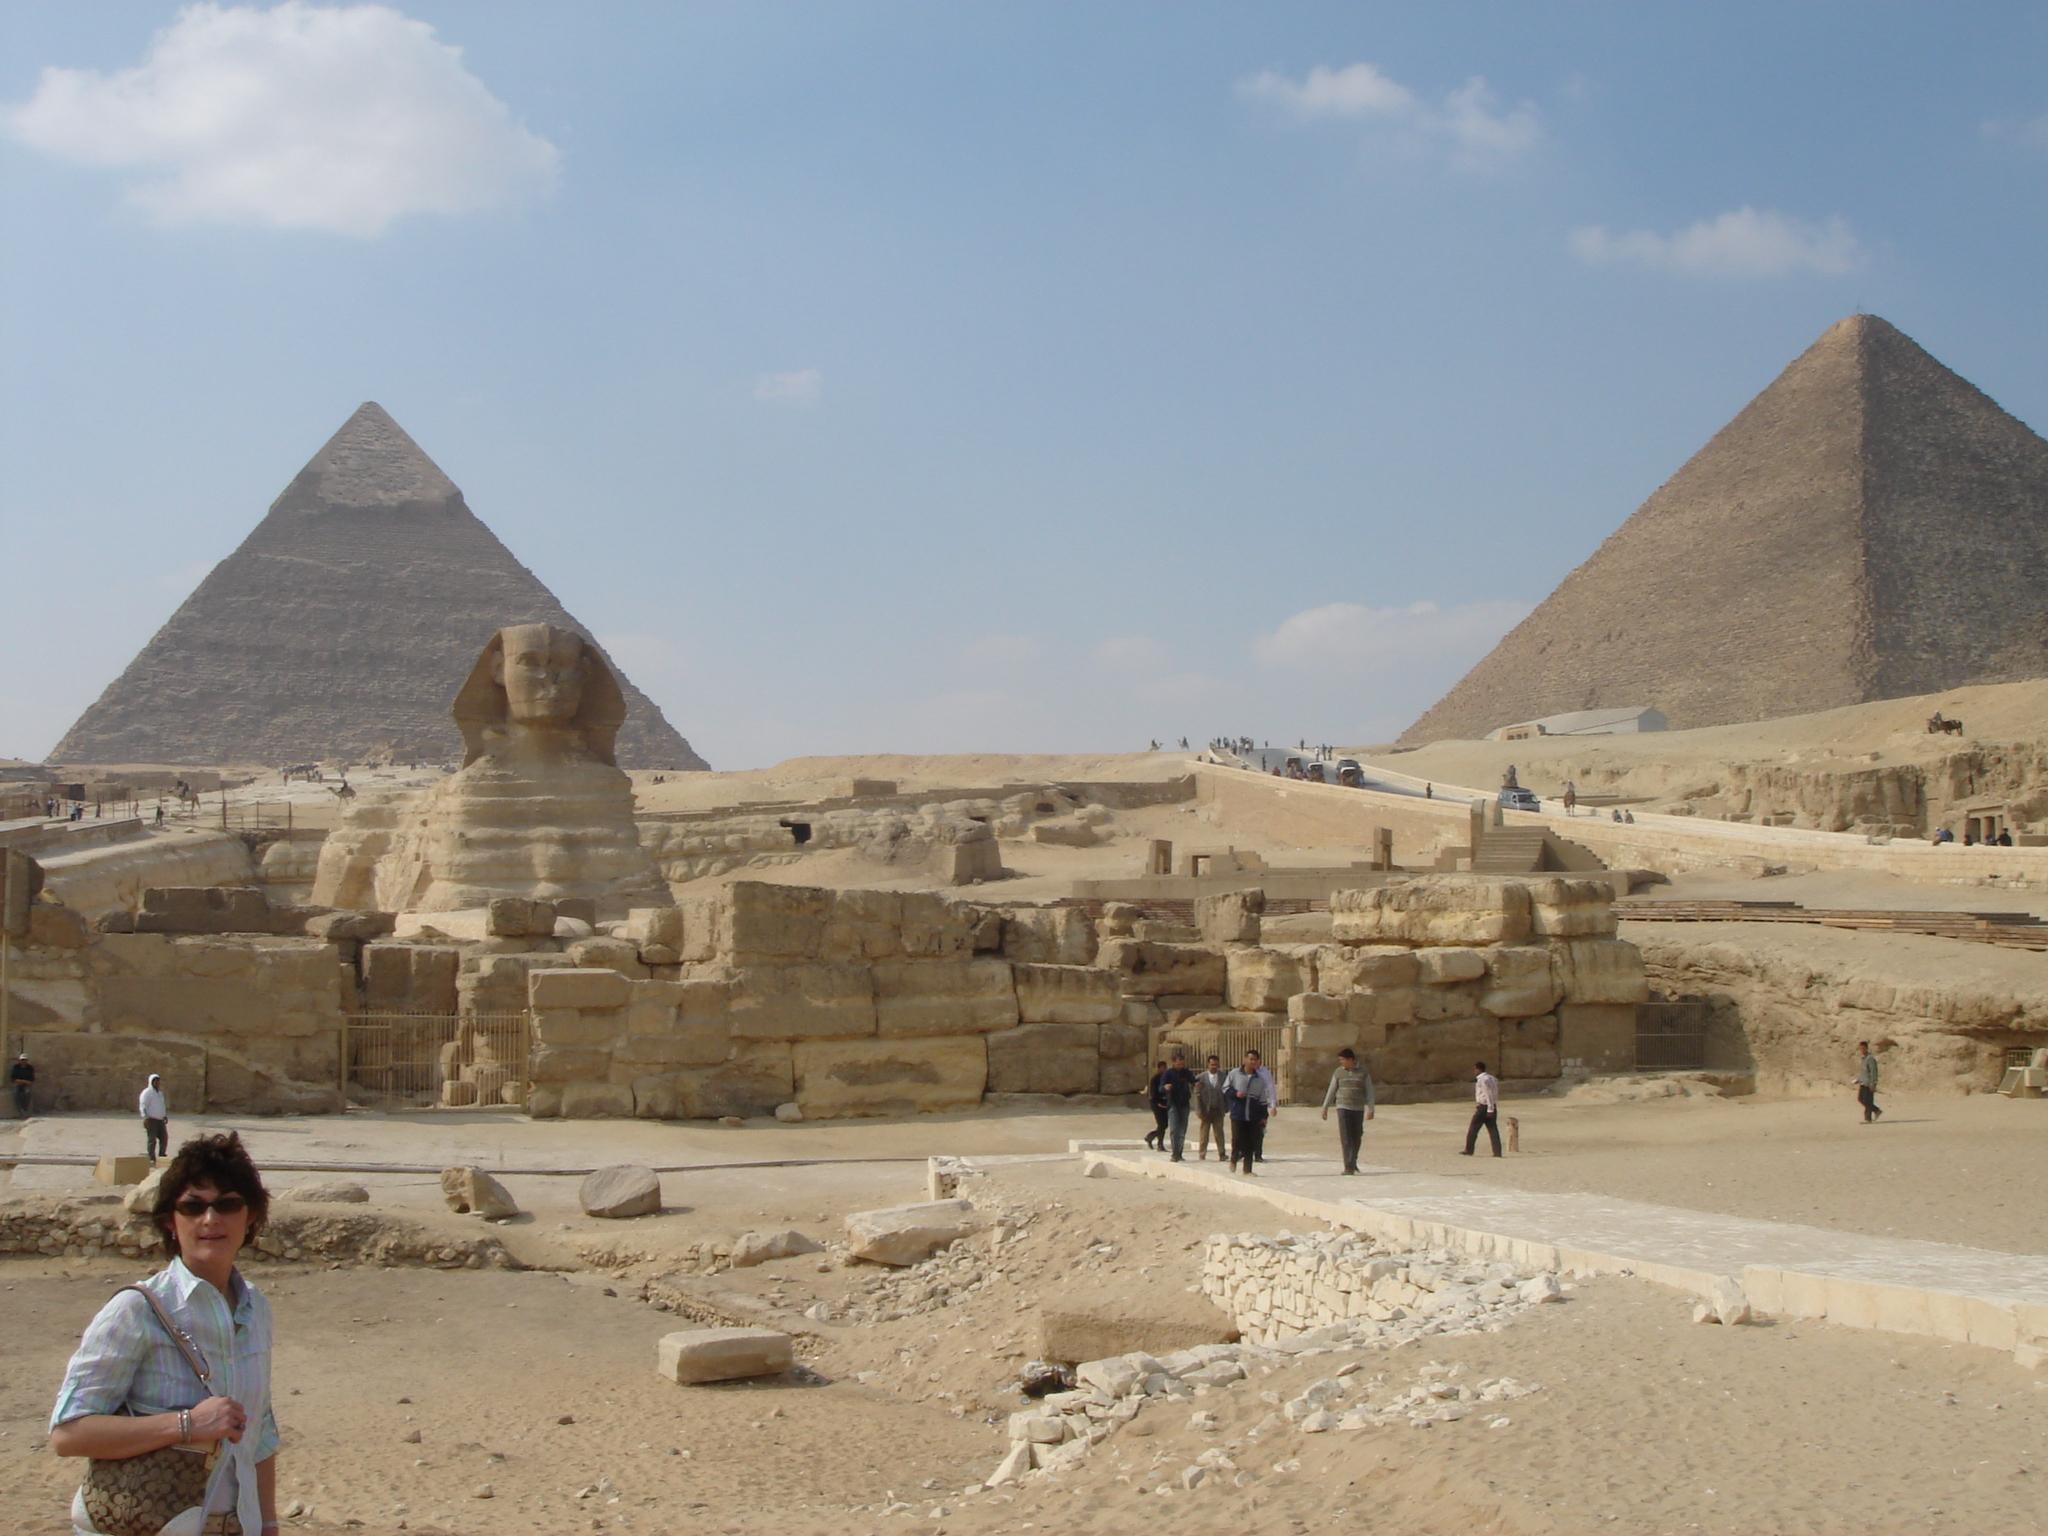 File:Egyptian Pyramids.jpg - Wikimedia Commons